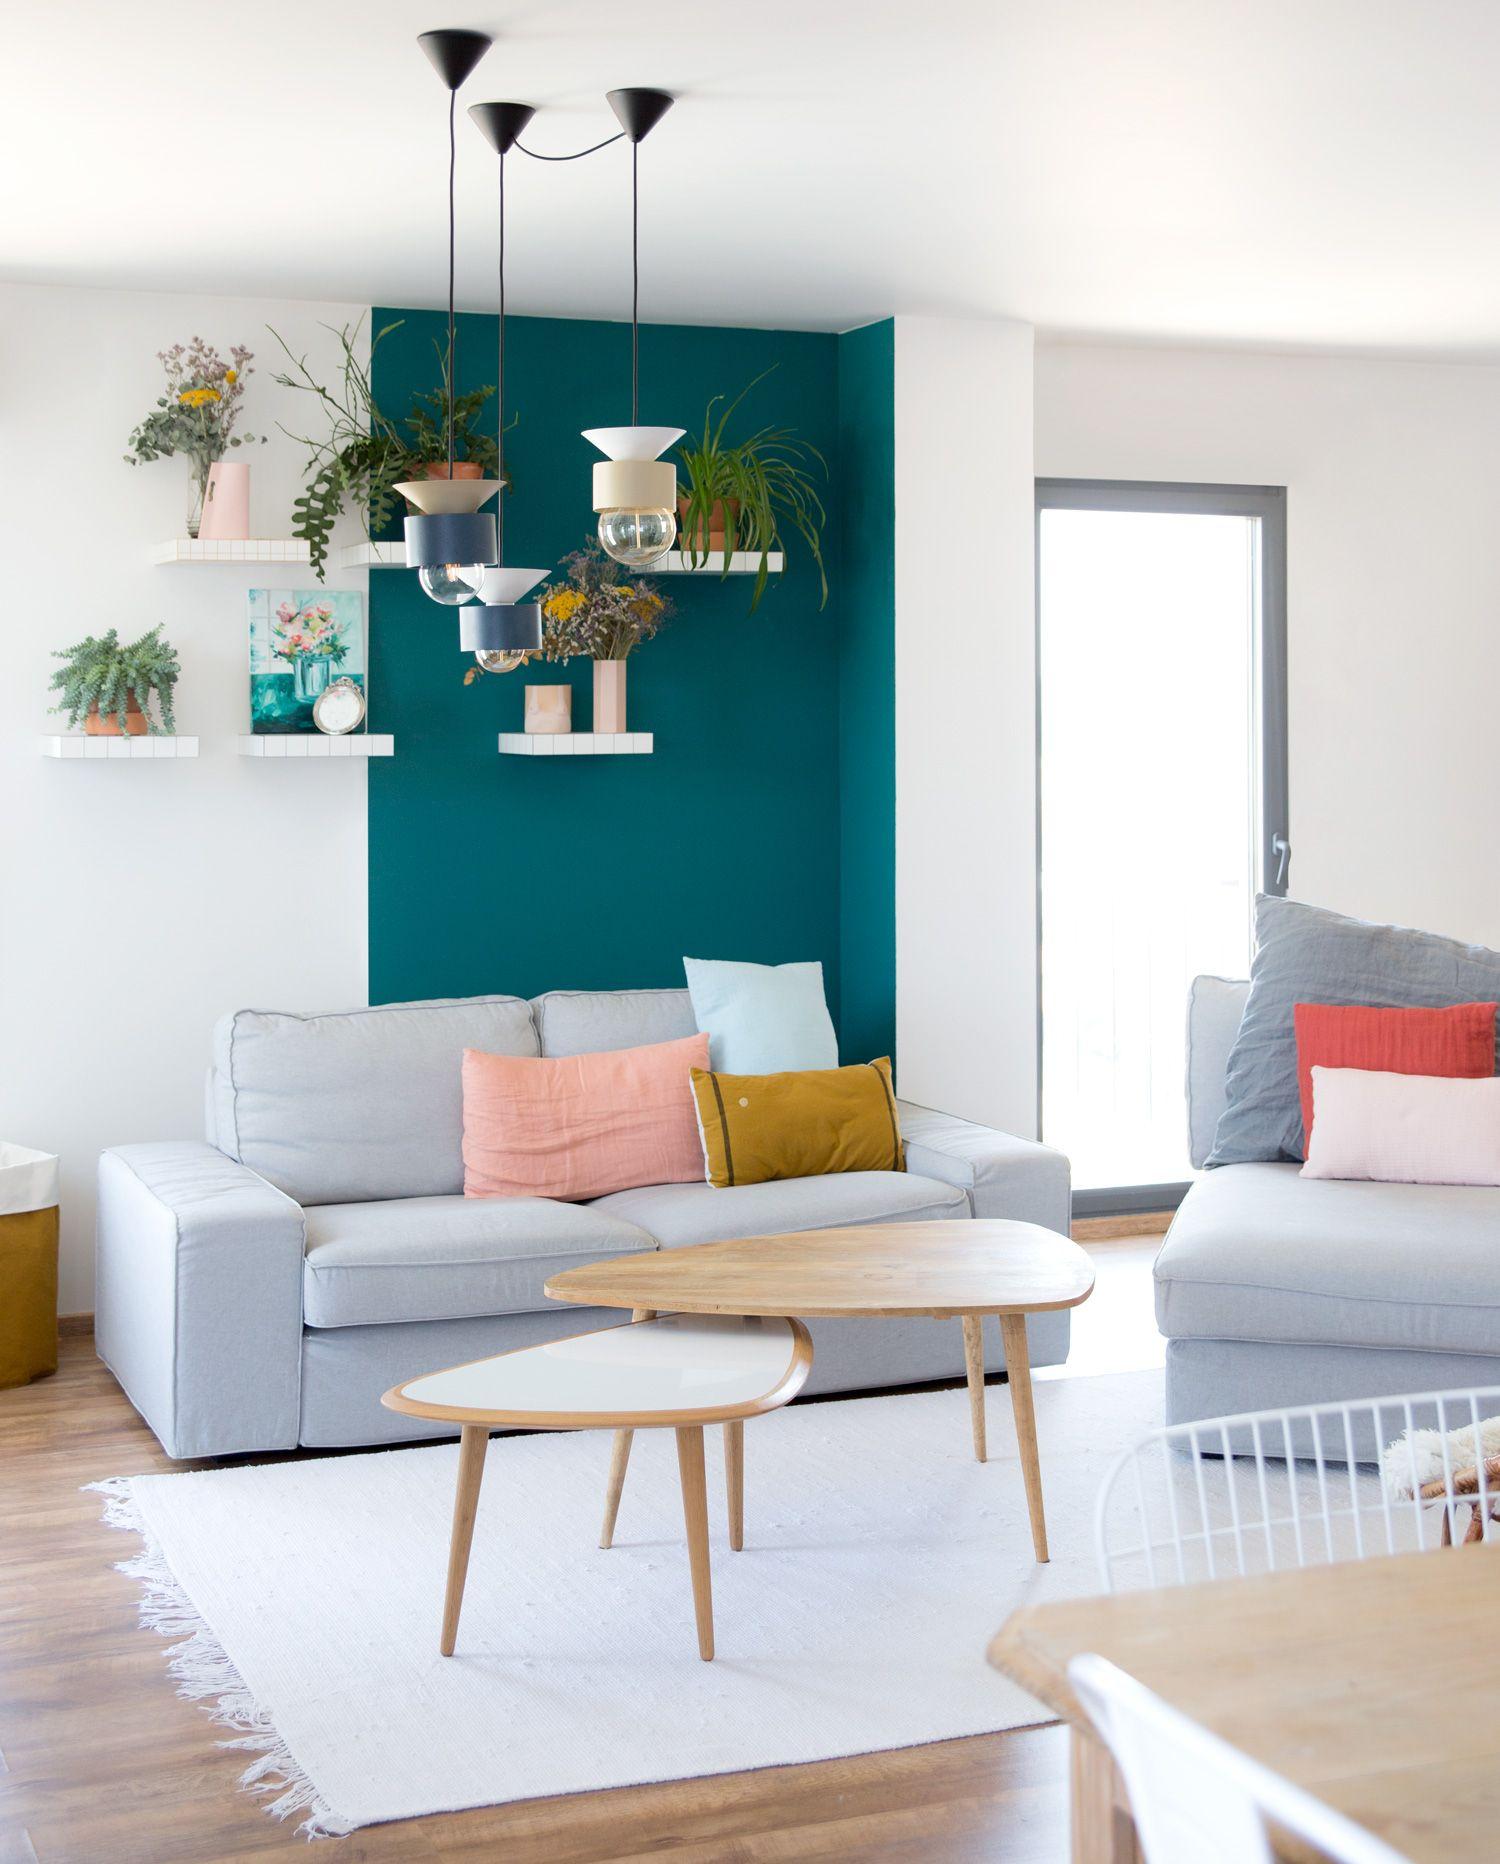 Decoration Salon Bleu Canard Et Jaune - Novocom.top